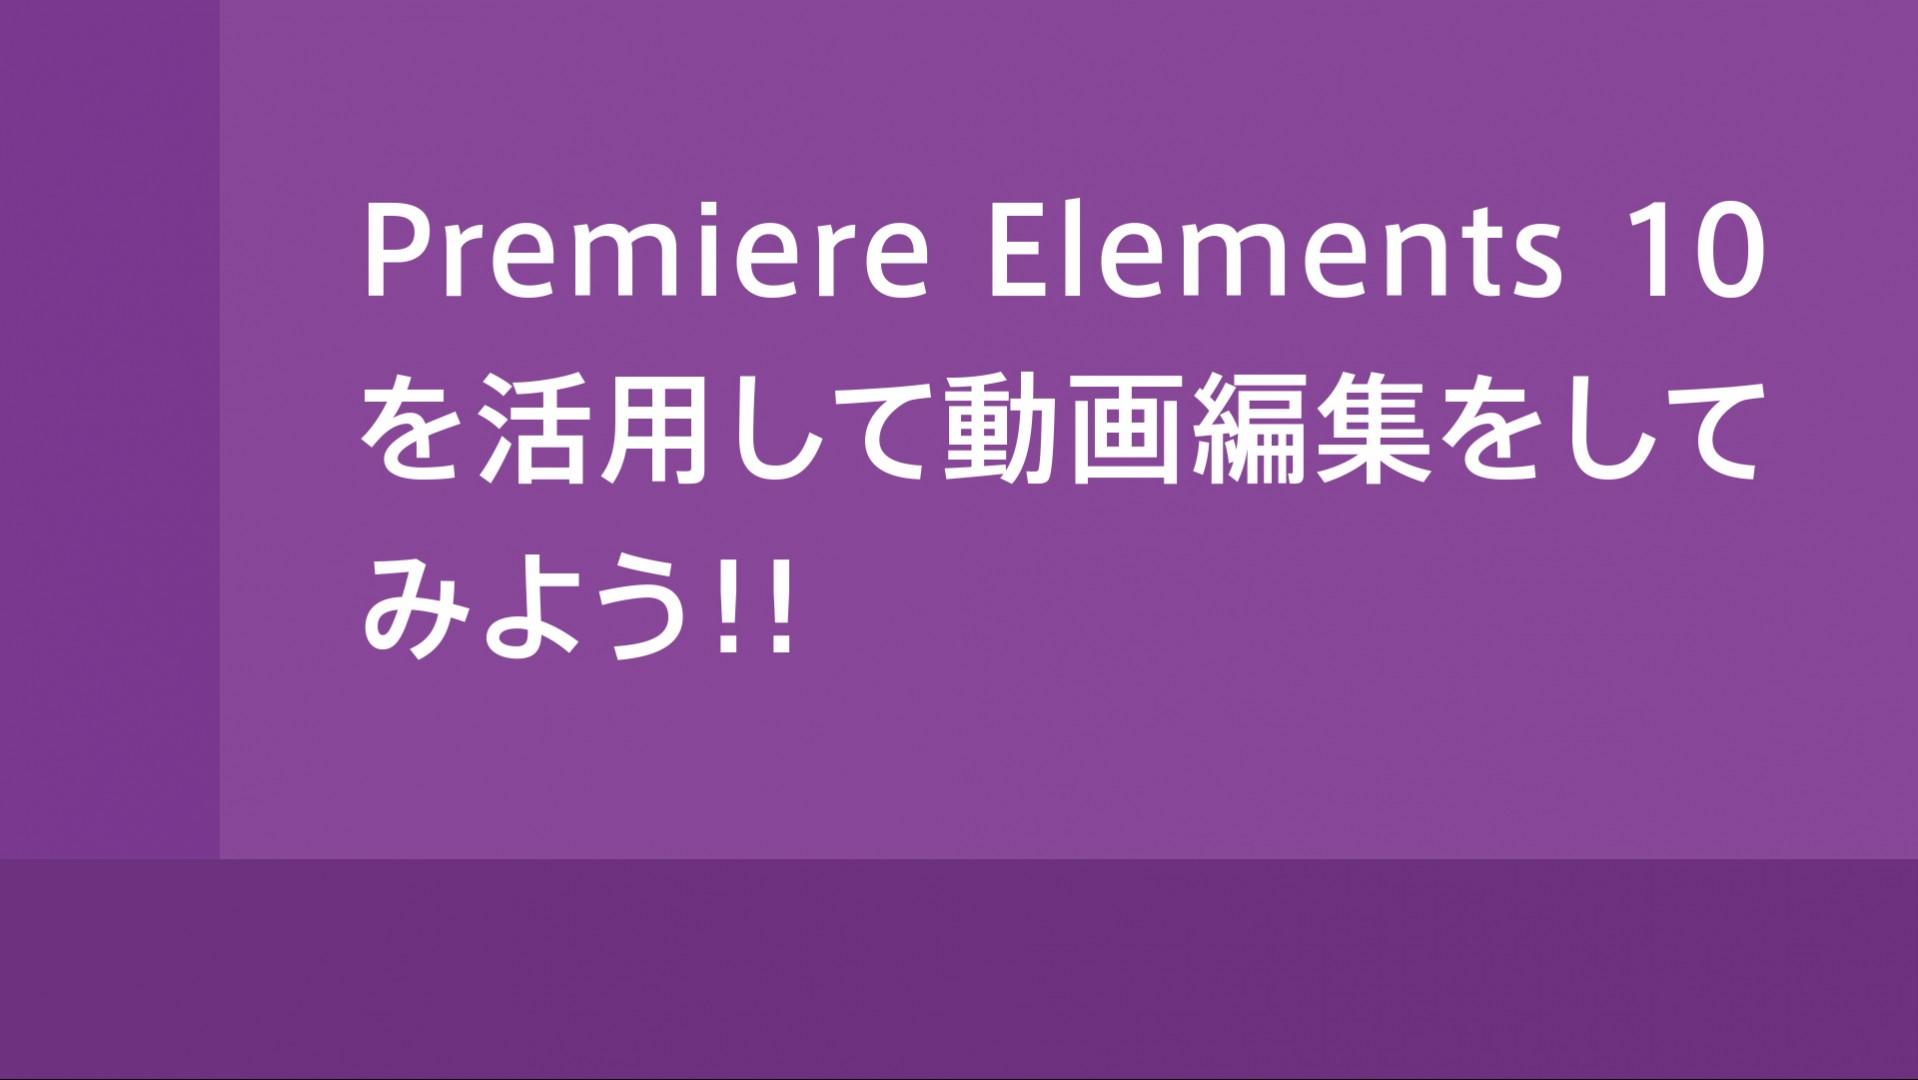 Premiere Elements 10 クリップを分割する